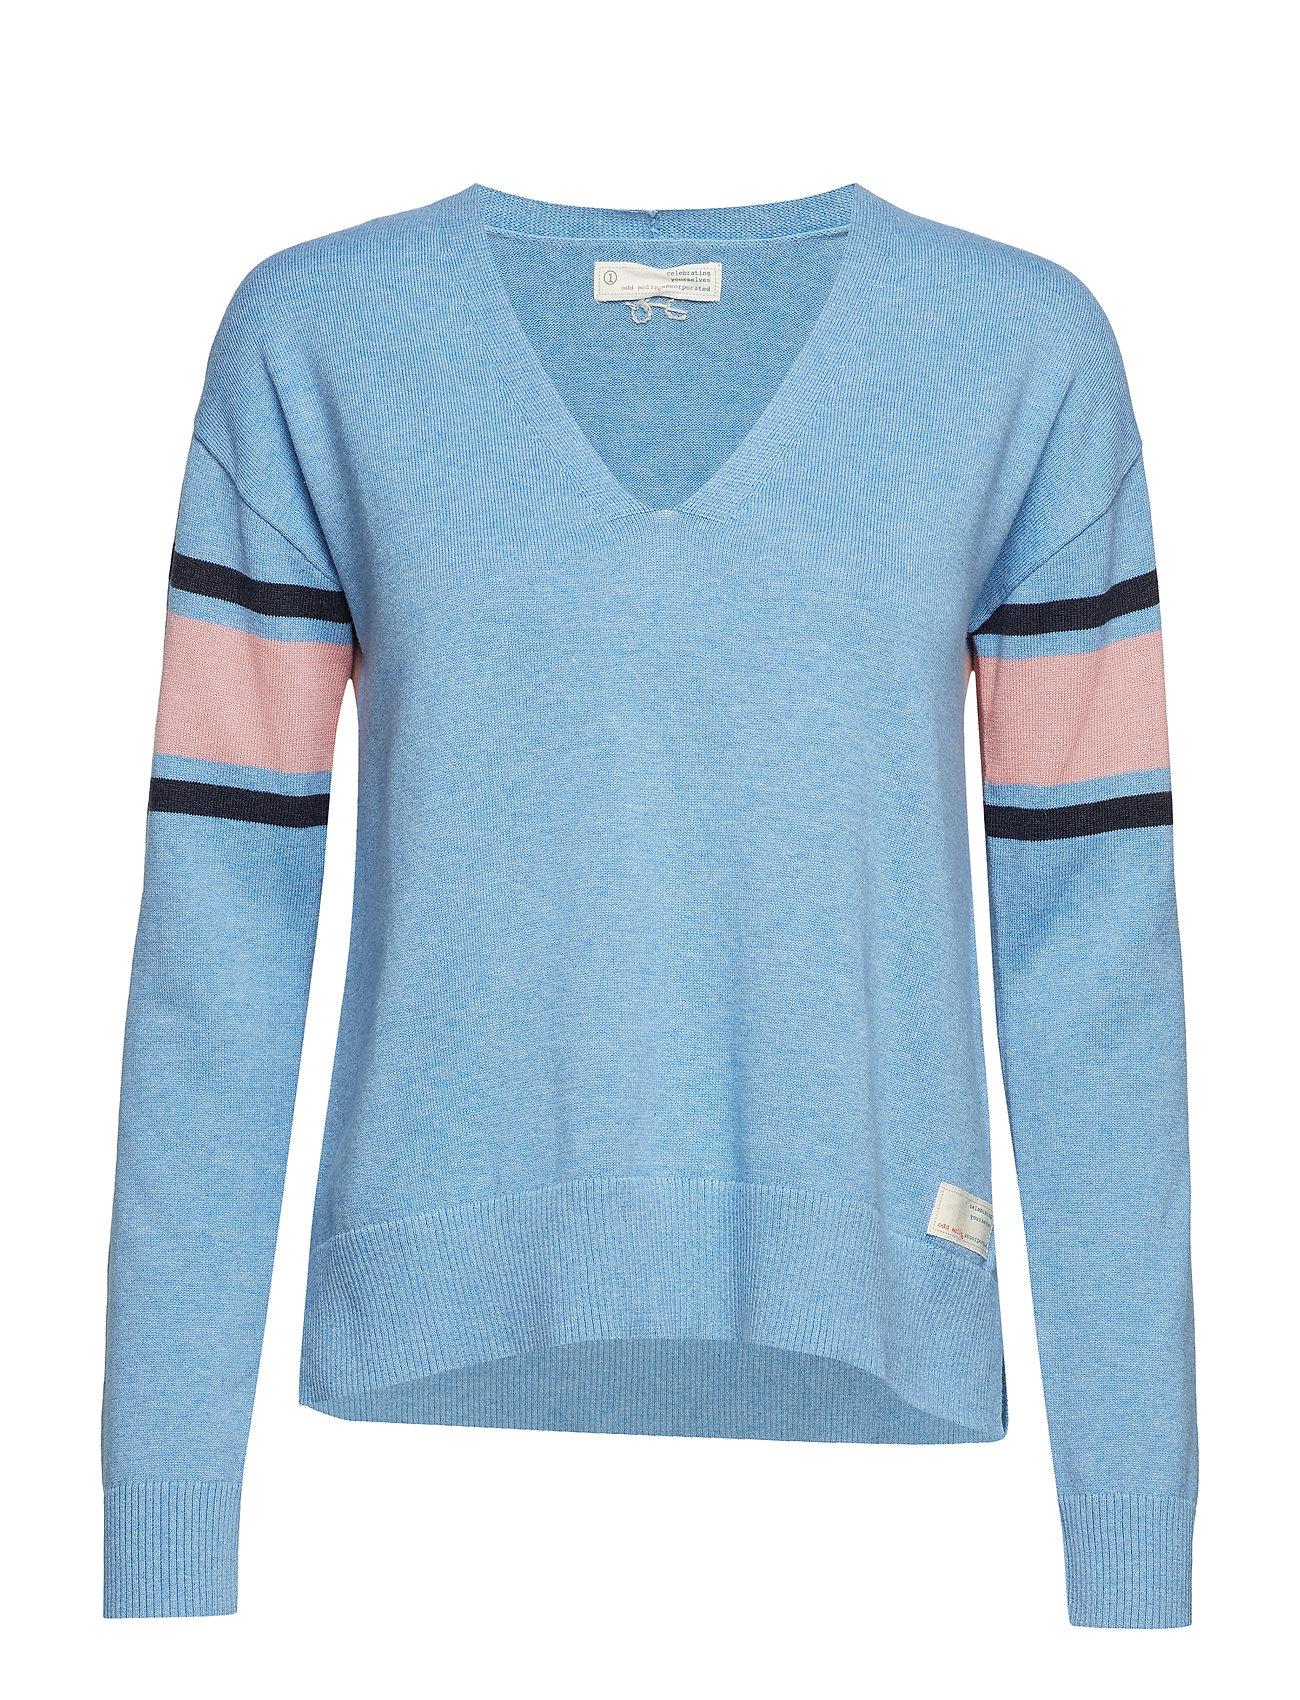 ODD MOLLY borderlands v-neck sweater - HERITAGE BLUE